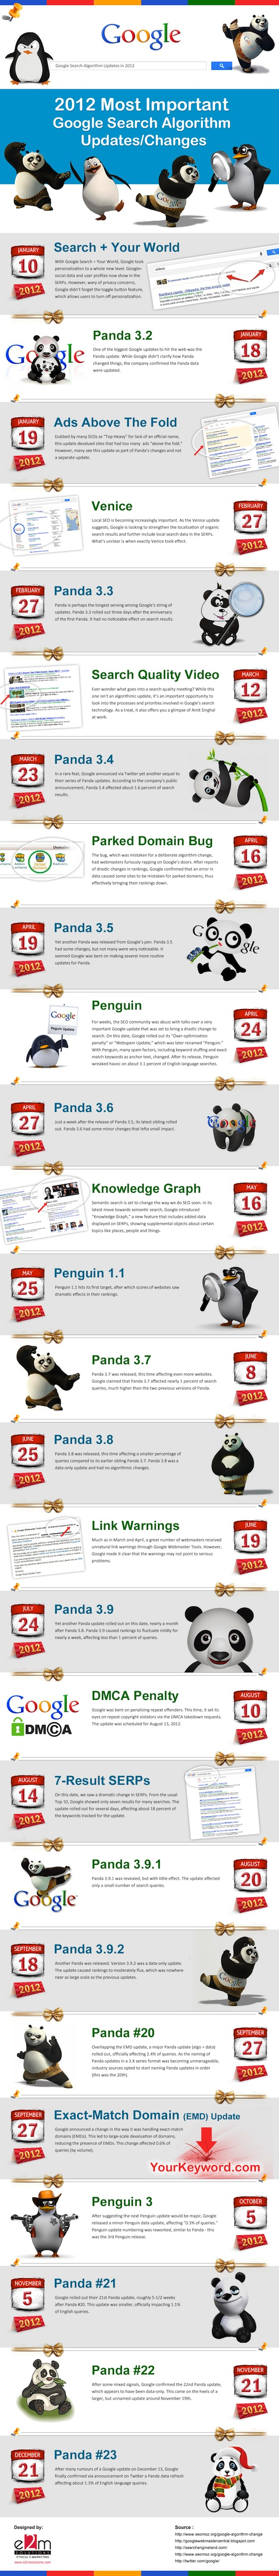 infographie google seo